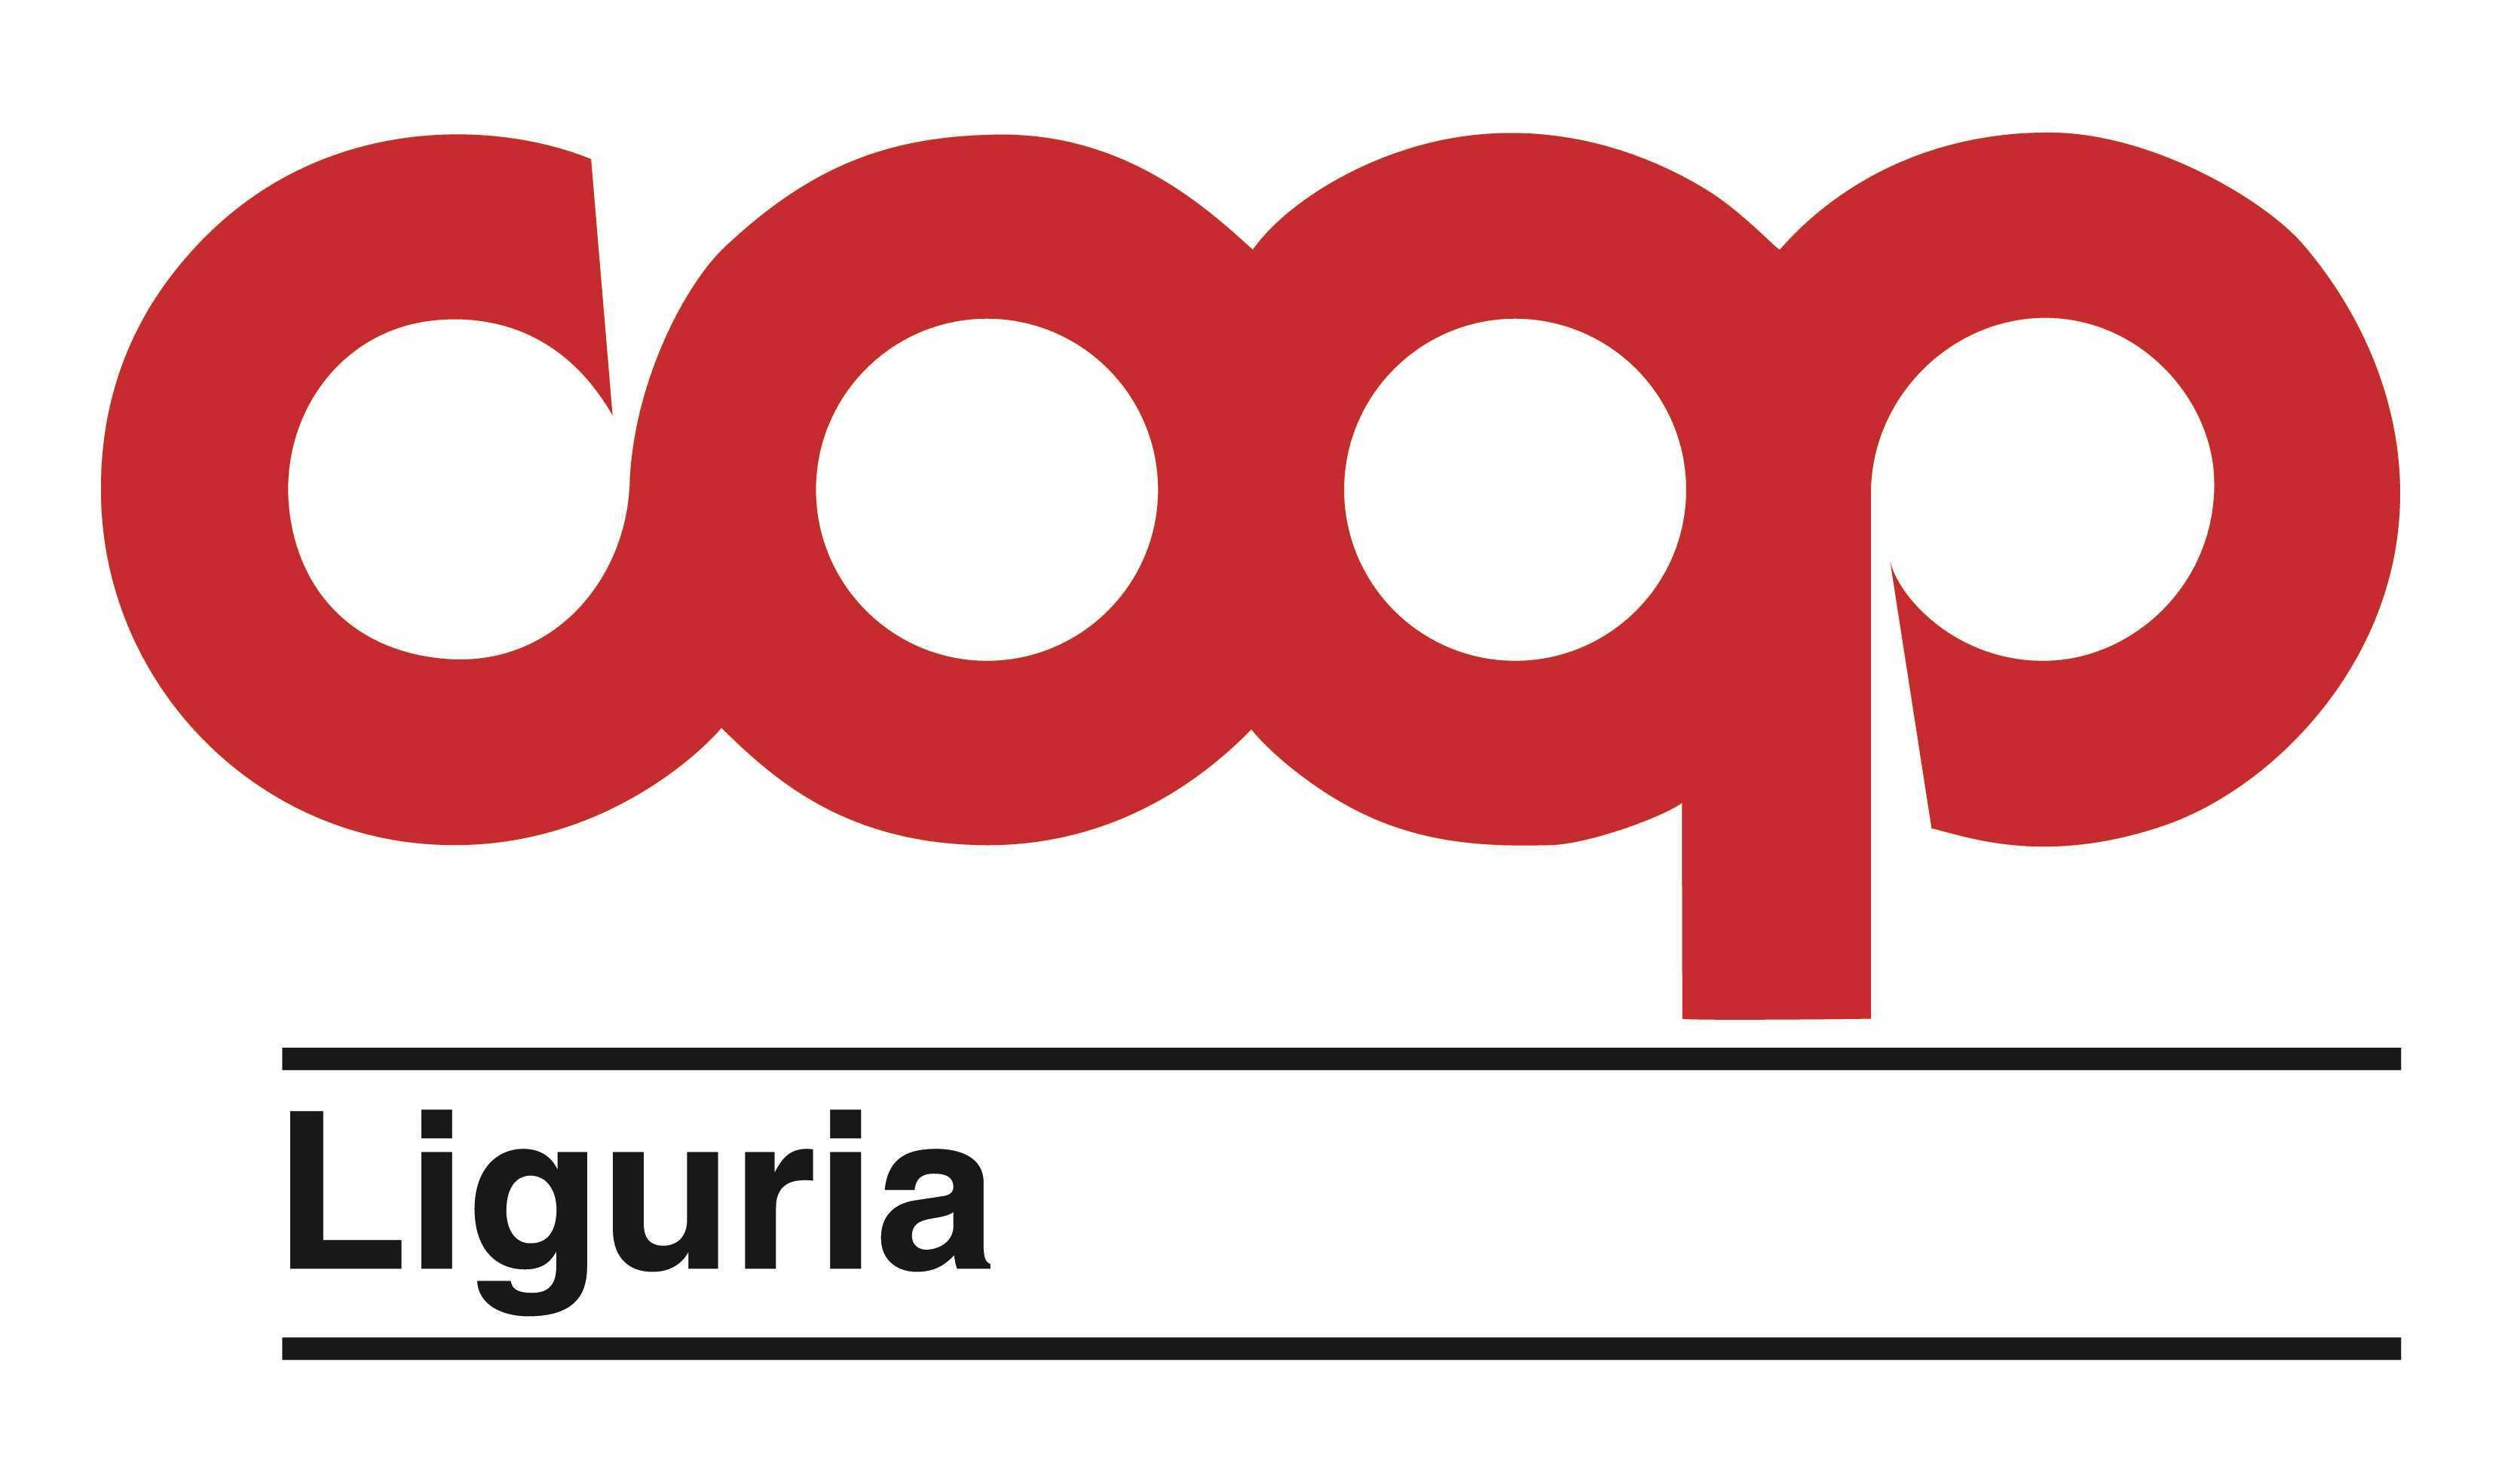 coop-liguria-logo